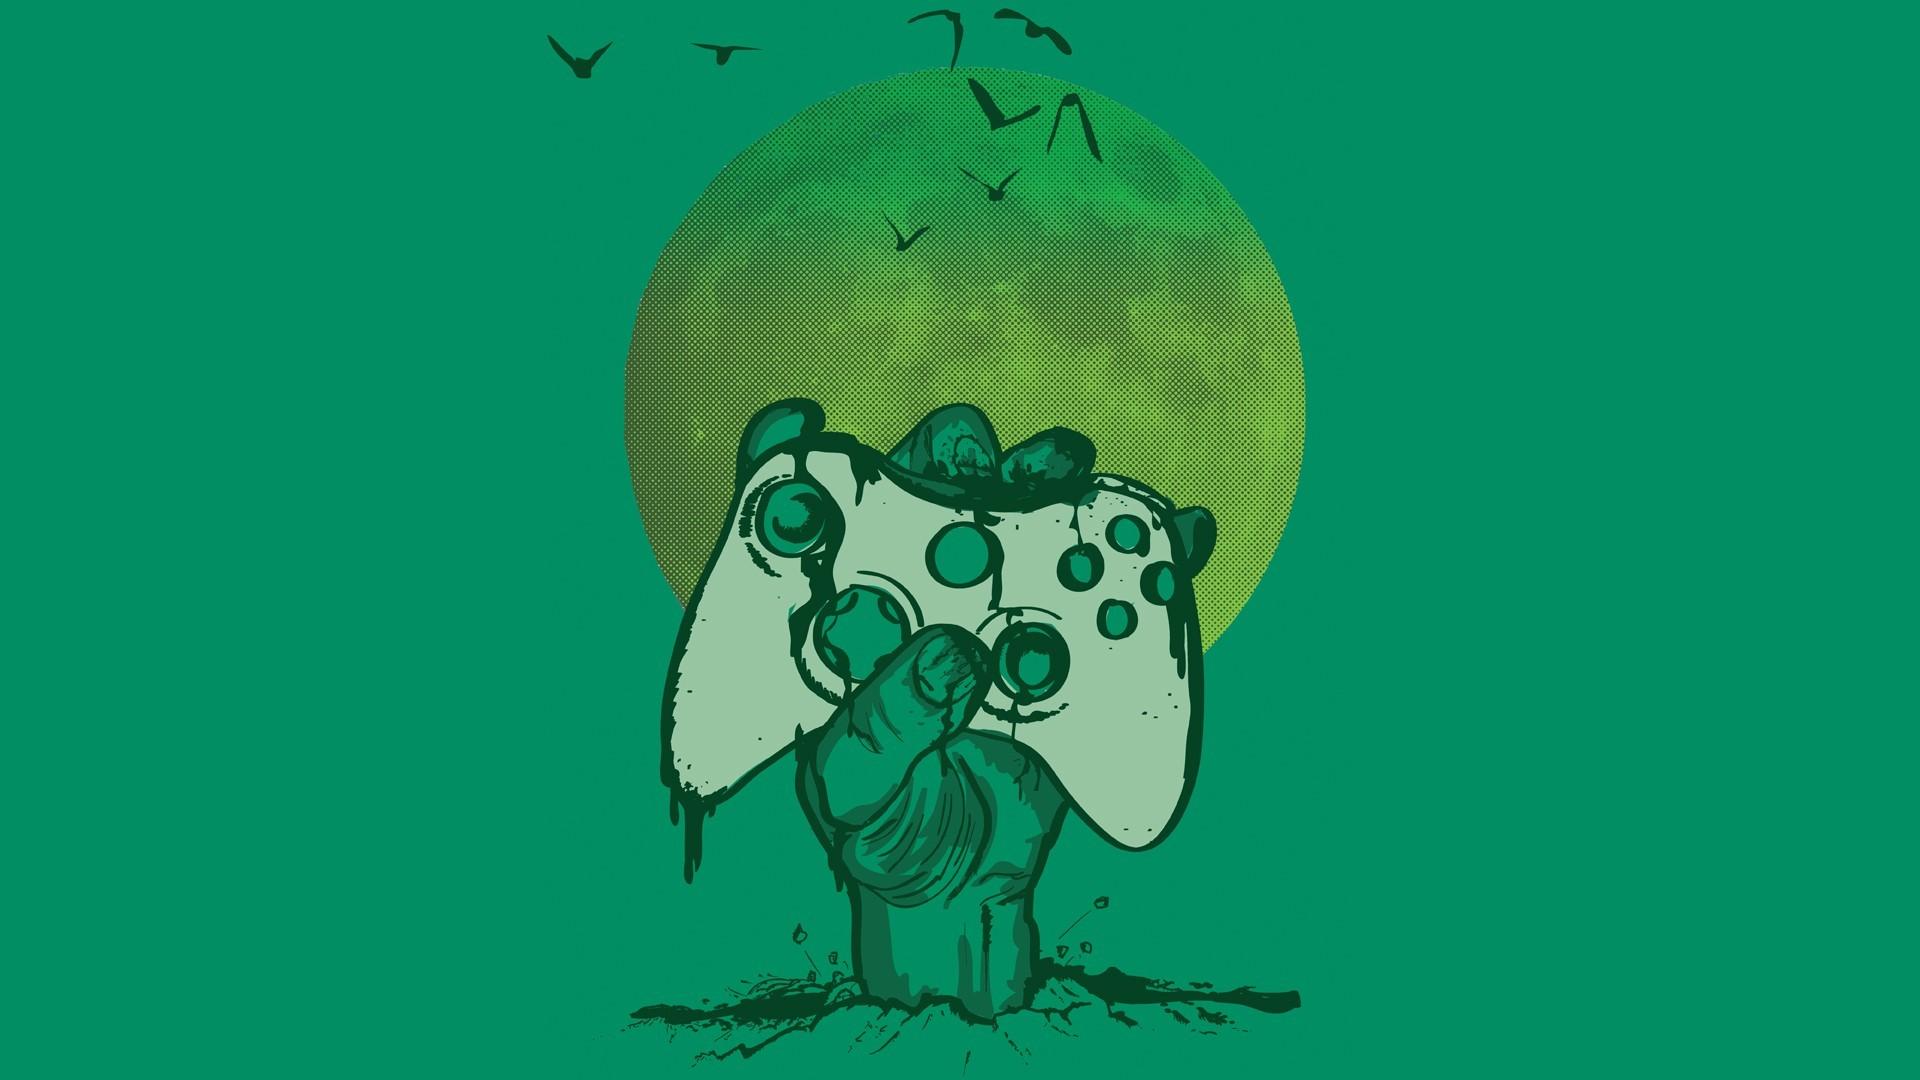 Xbox 360 Wallpaper Hd